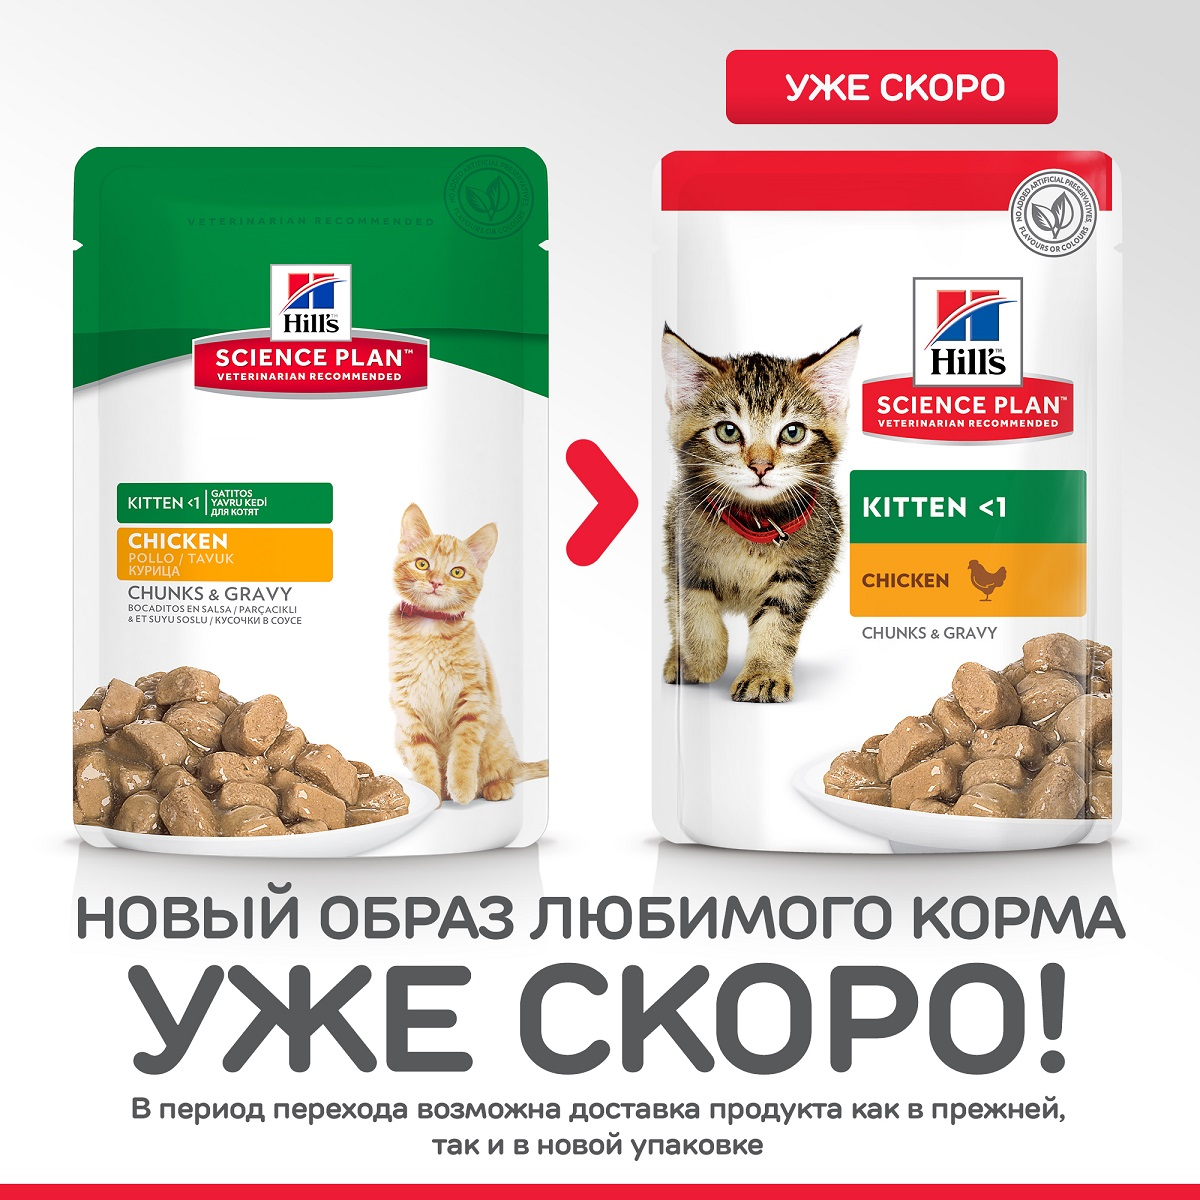 Hill's Science Plan Healthy Development Kitten Курица 85гр 60575